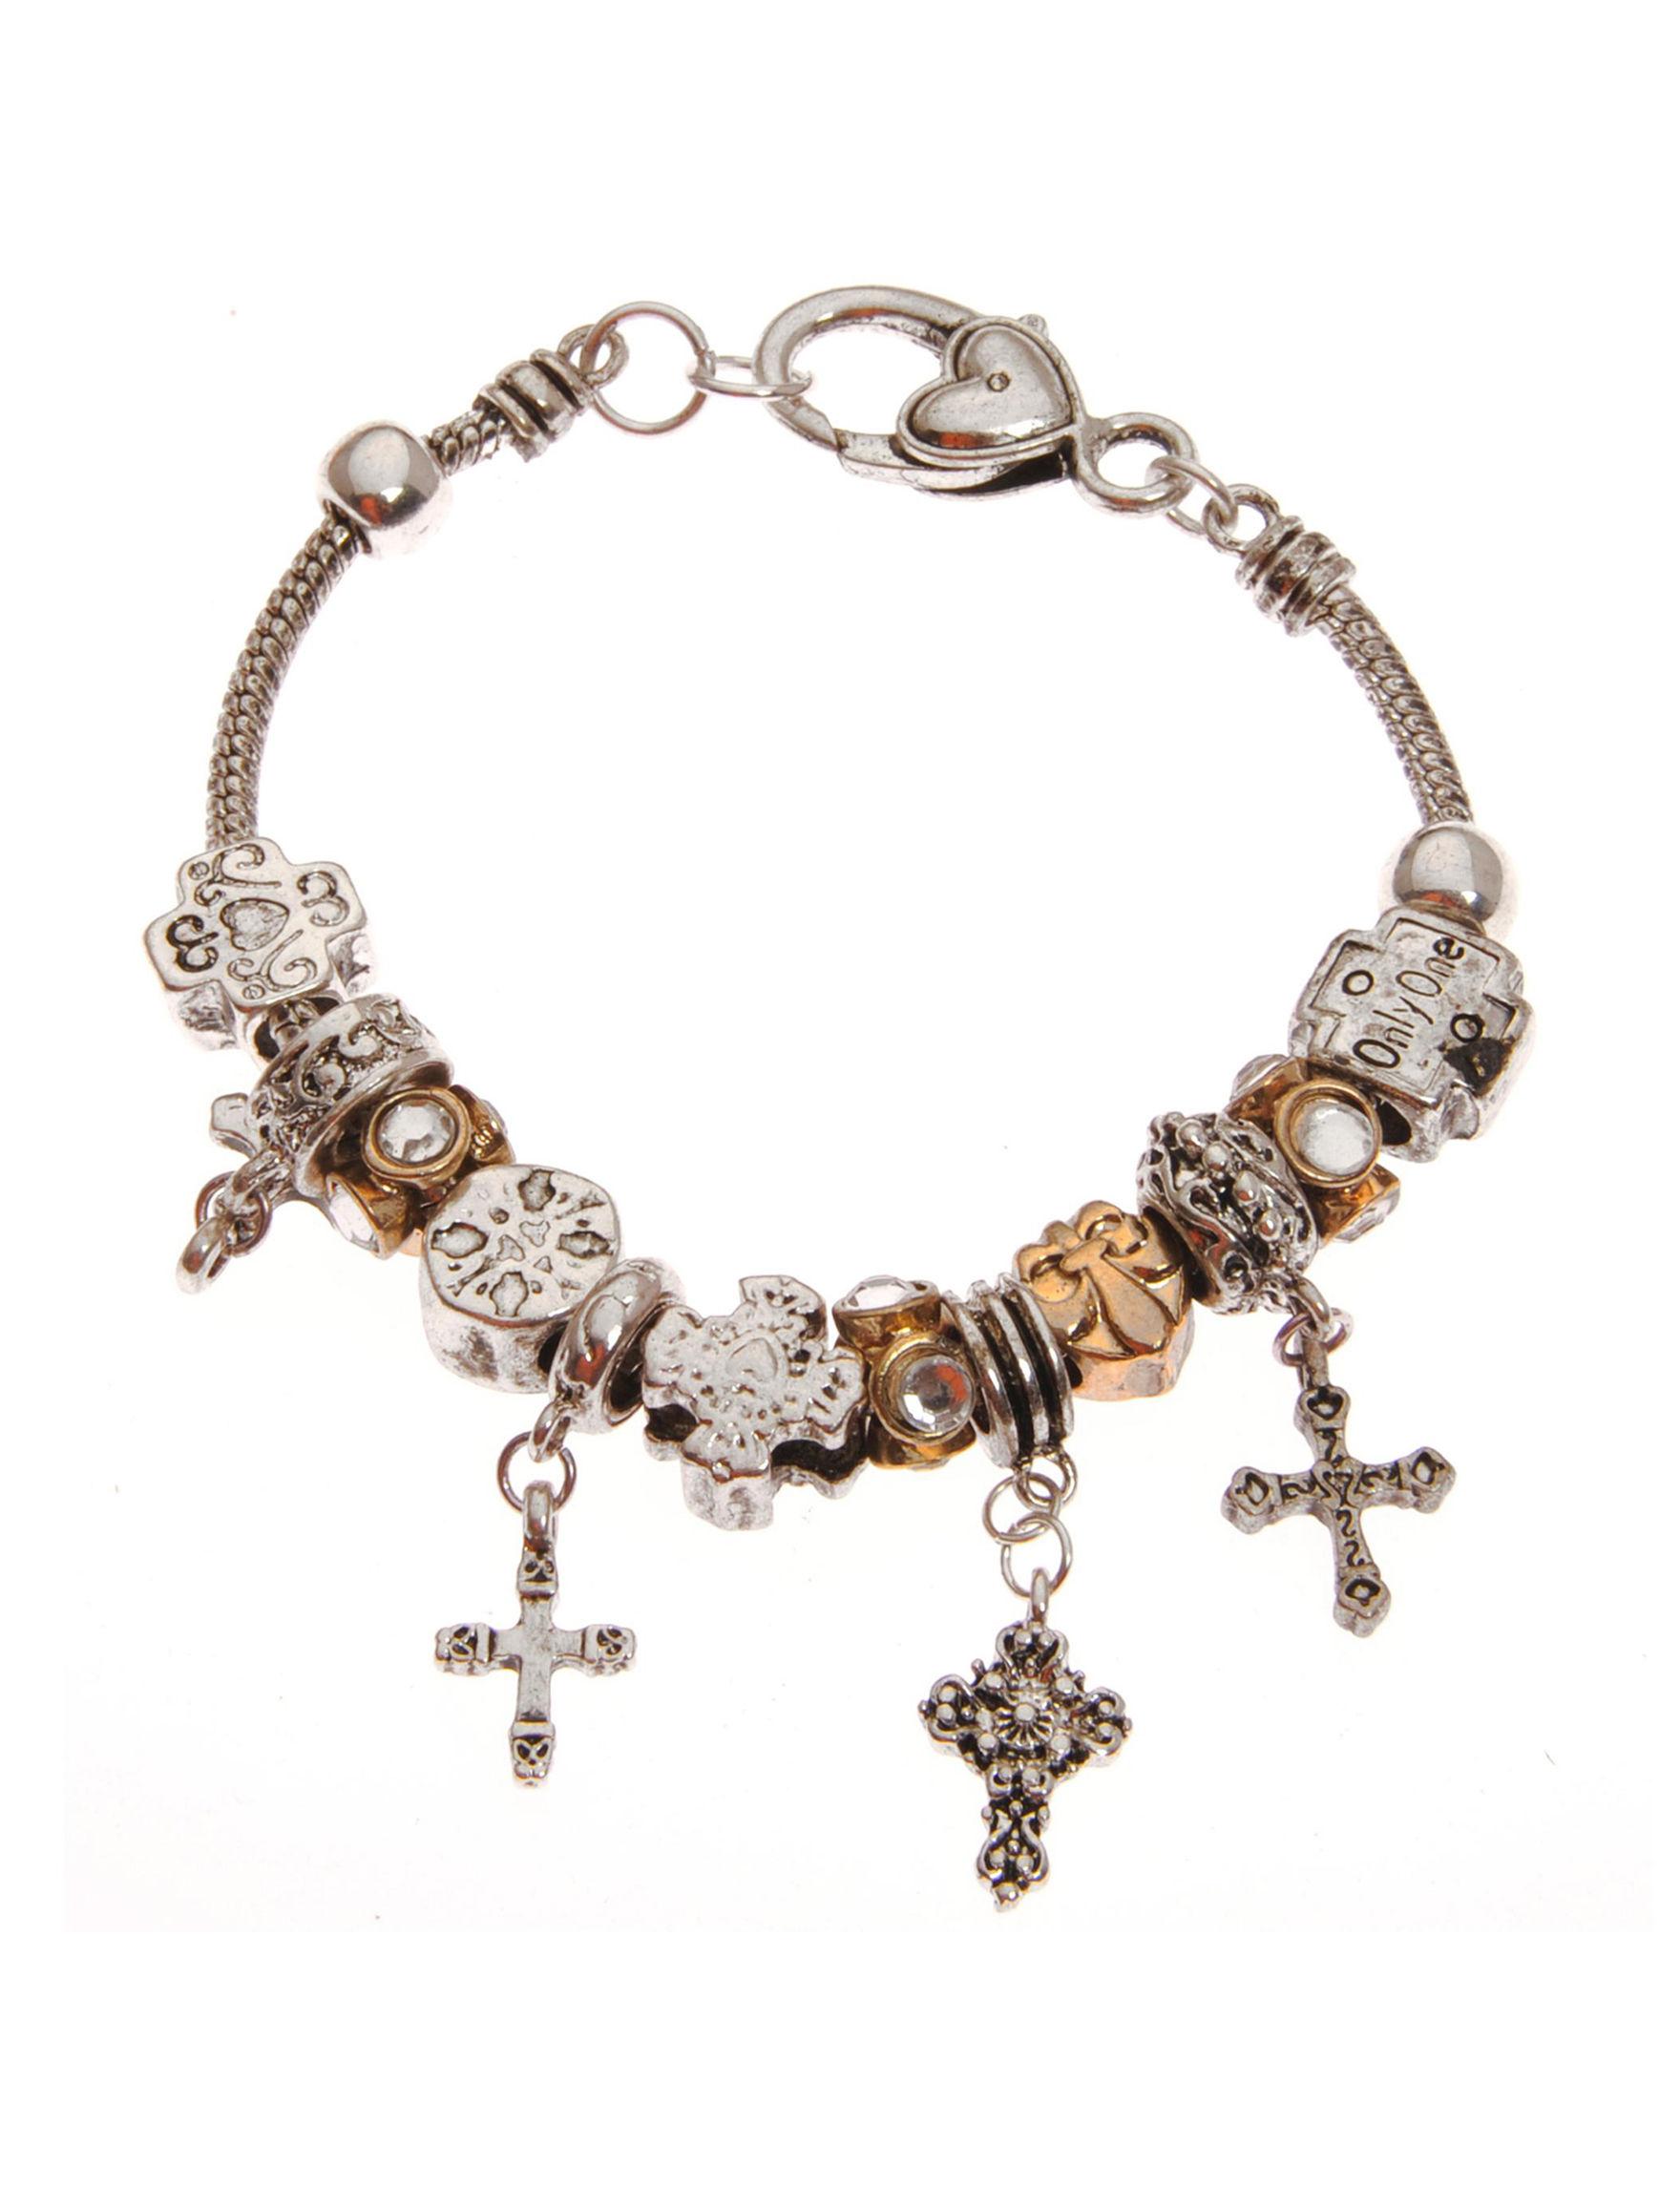 Tanya Two Tone Fashion Jewelry